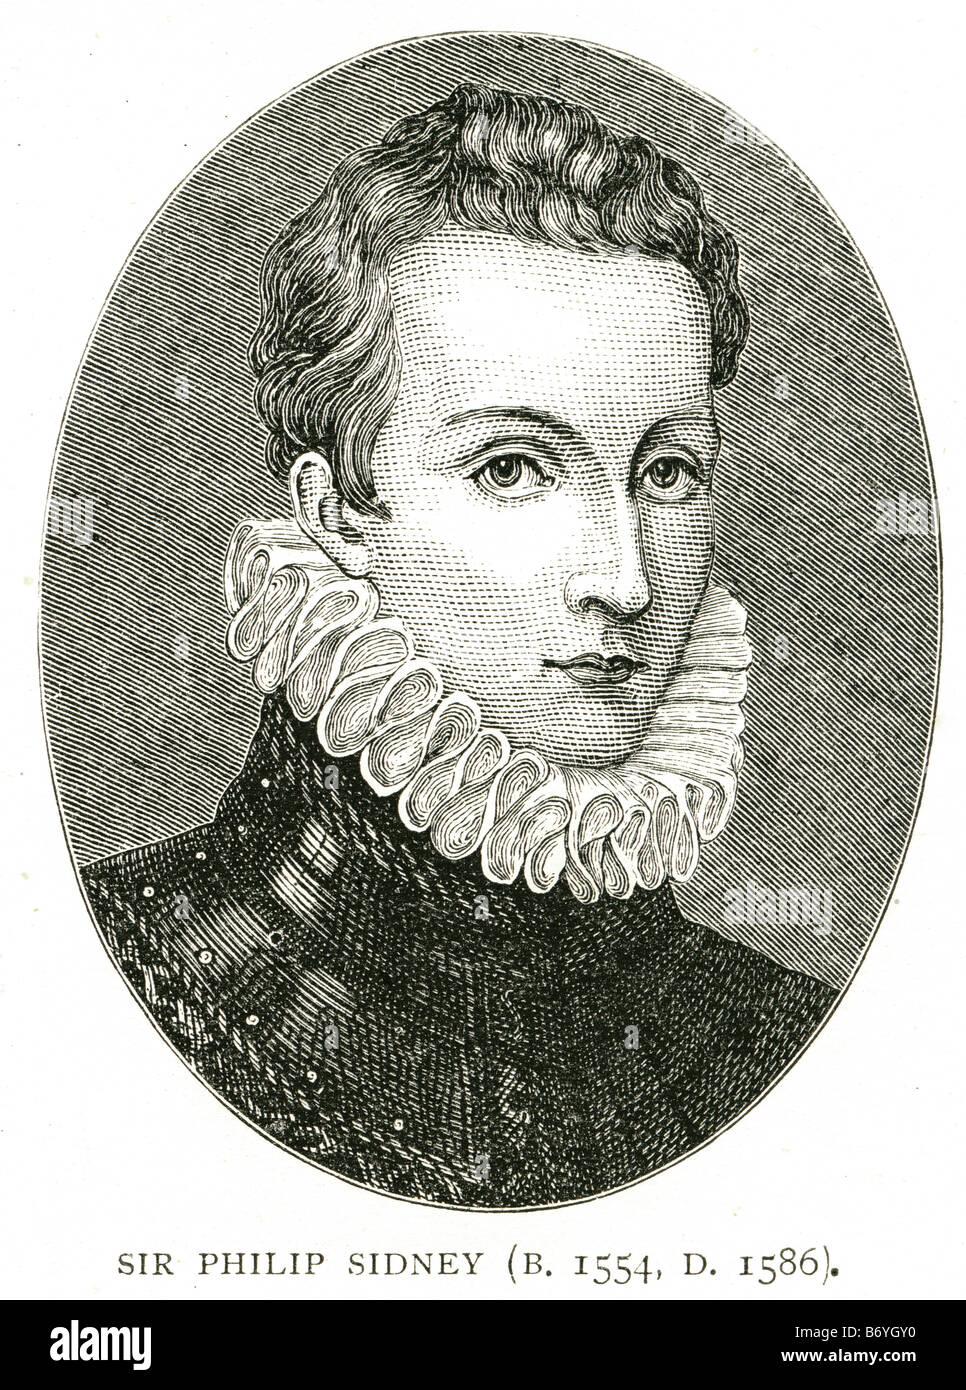 sir philip sidney November 30 1554 – October 17 1586 poet courtier soldier Astrophel Stella Poetry - Stock Image